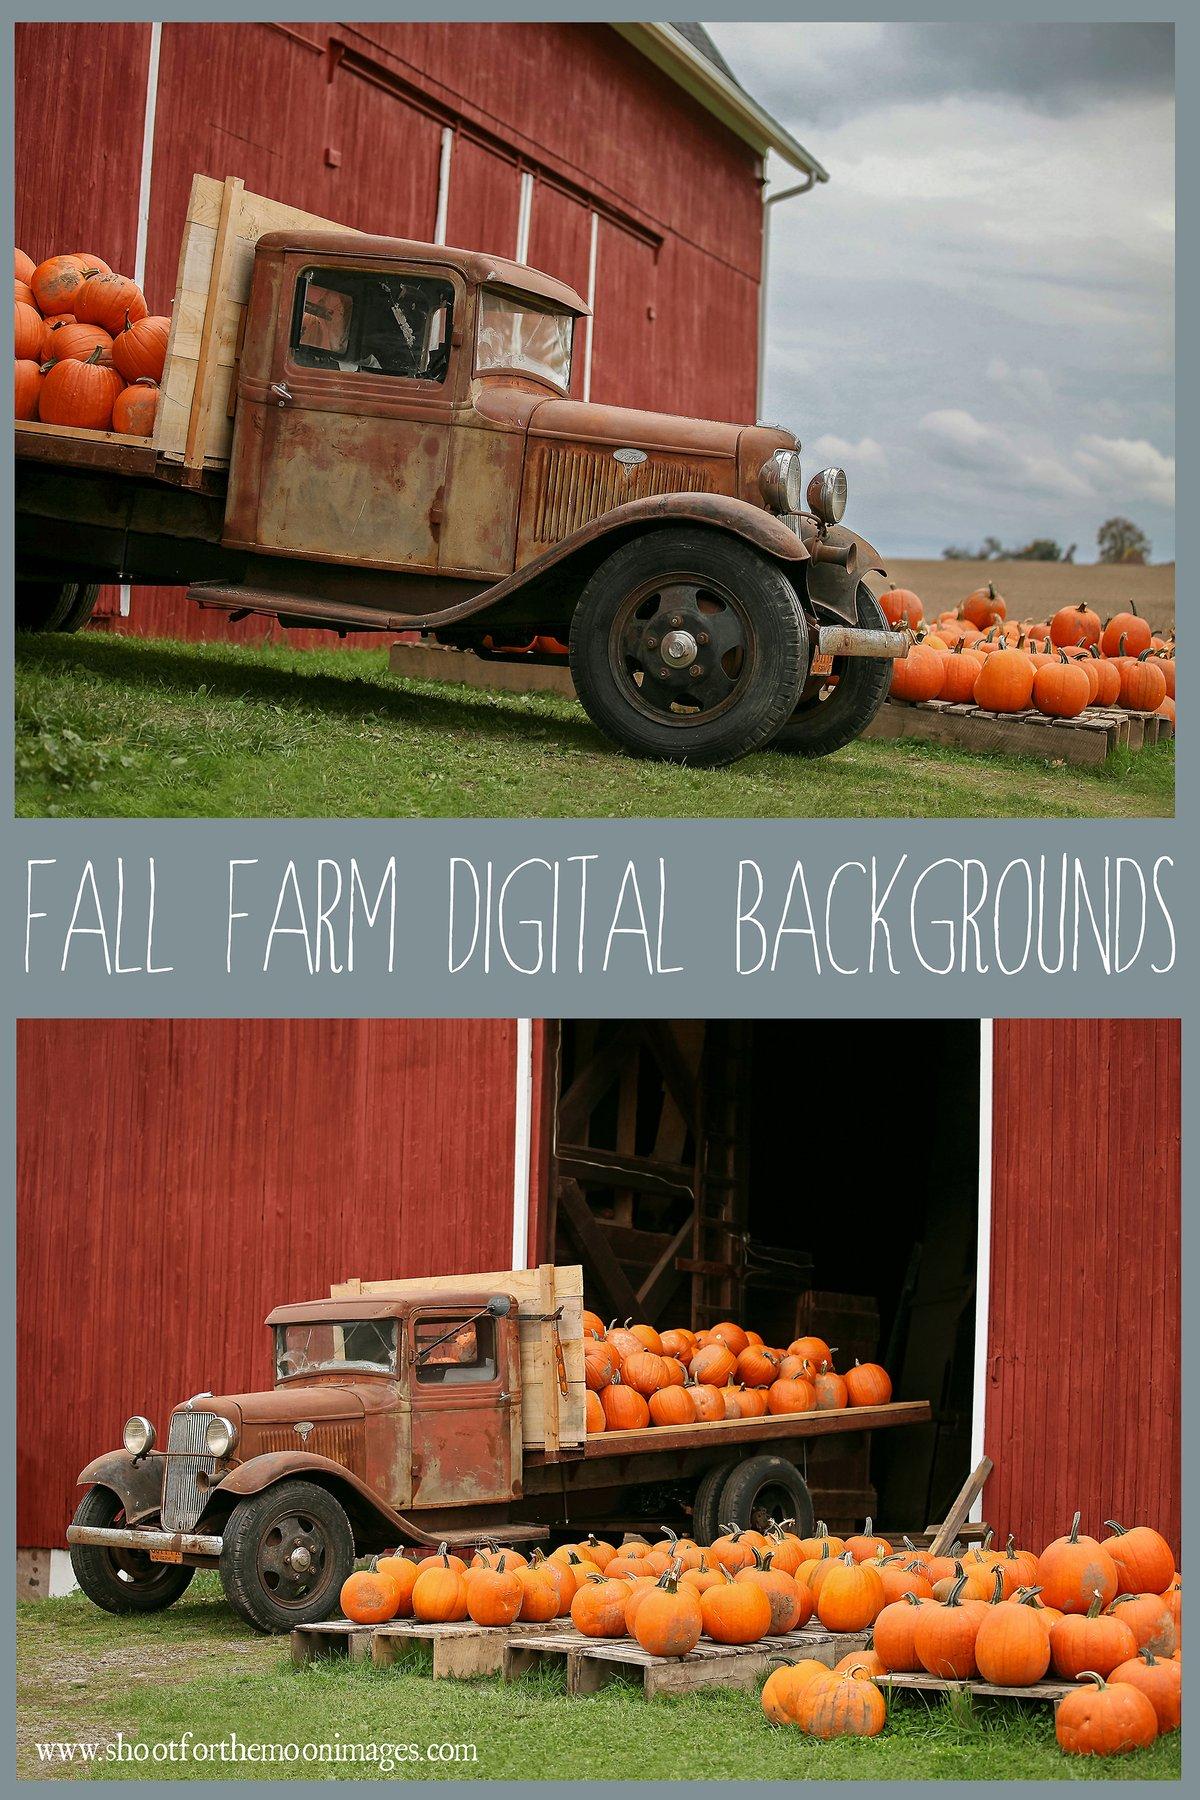 Image of Fall Farm Digital Backgrounds